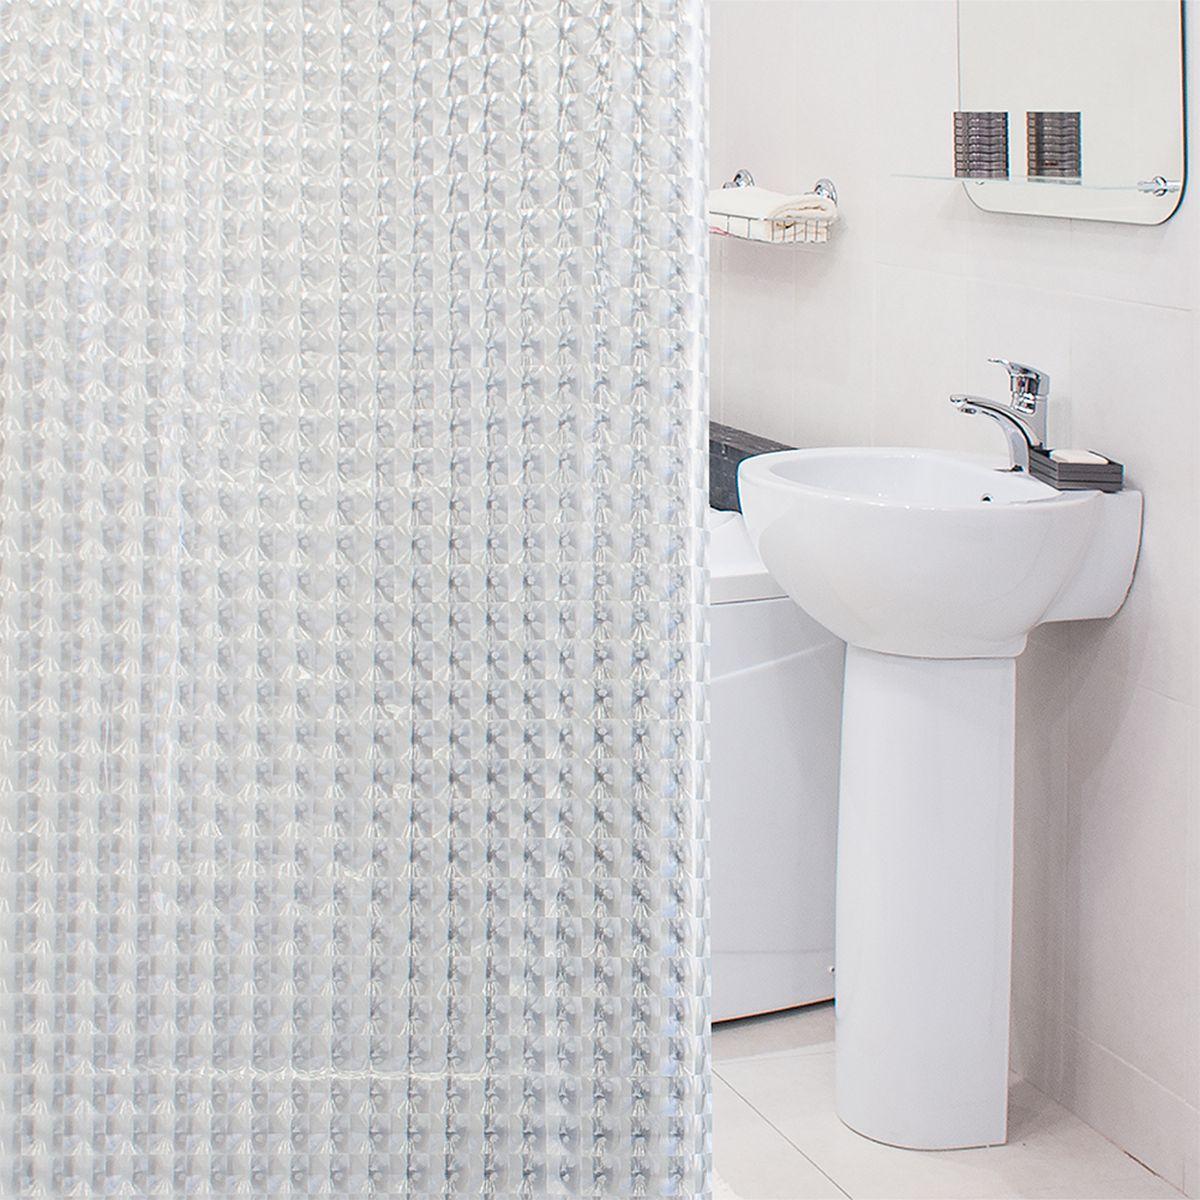 Фото - Штора для ванной комнаты 3D Tatkraft Crystal, с кольцами, 180 х 180 см штора для ванной комнаты tatkraft stone garden 180 х 180 см